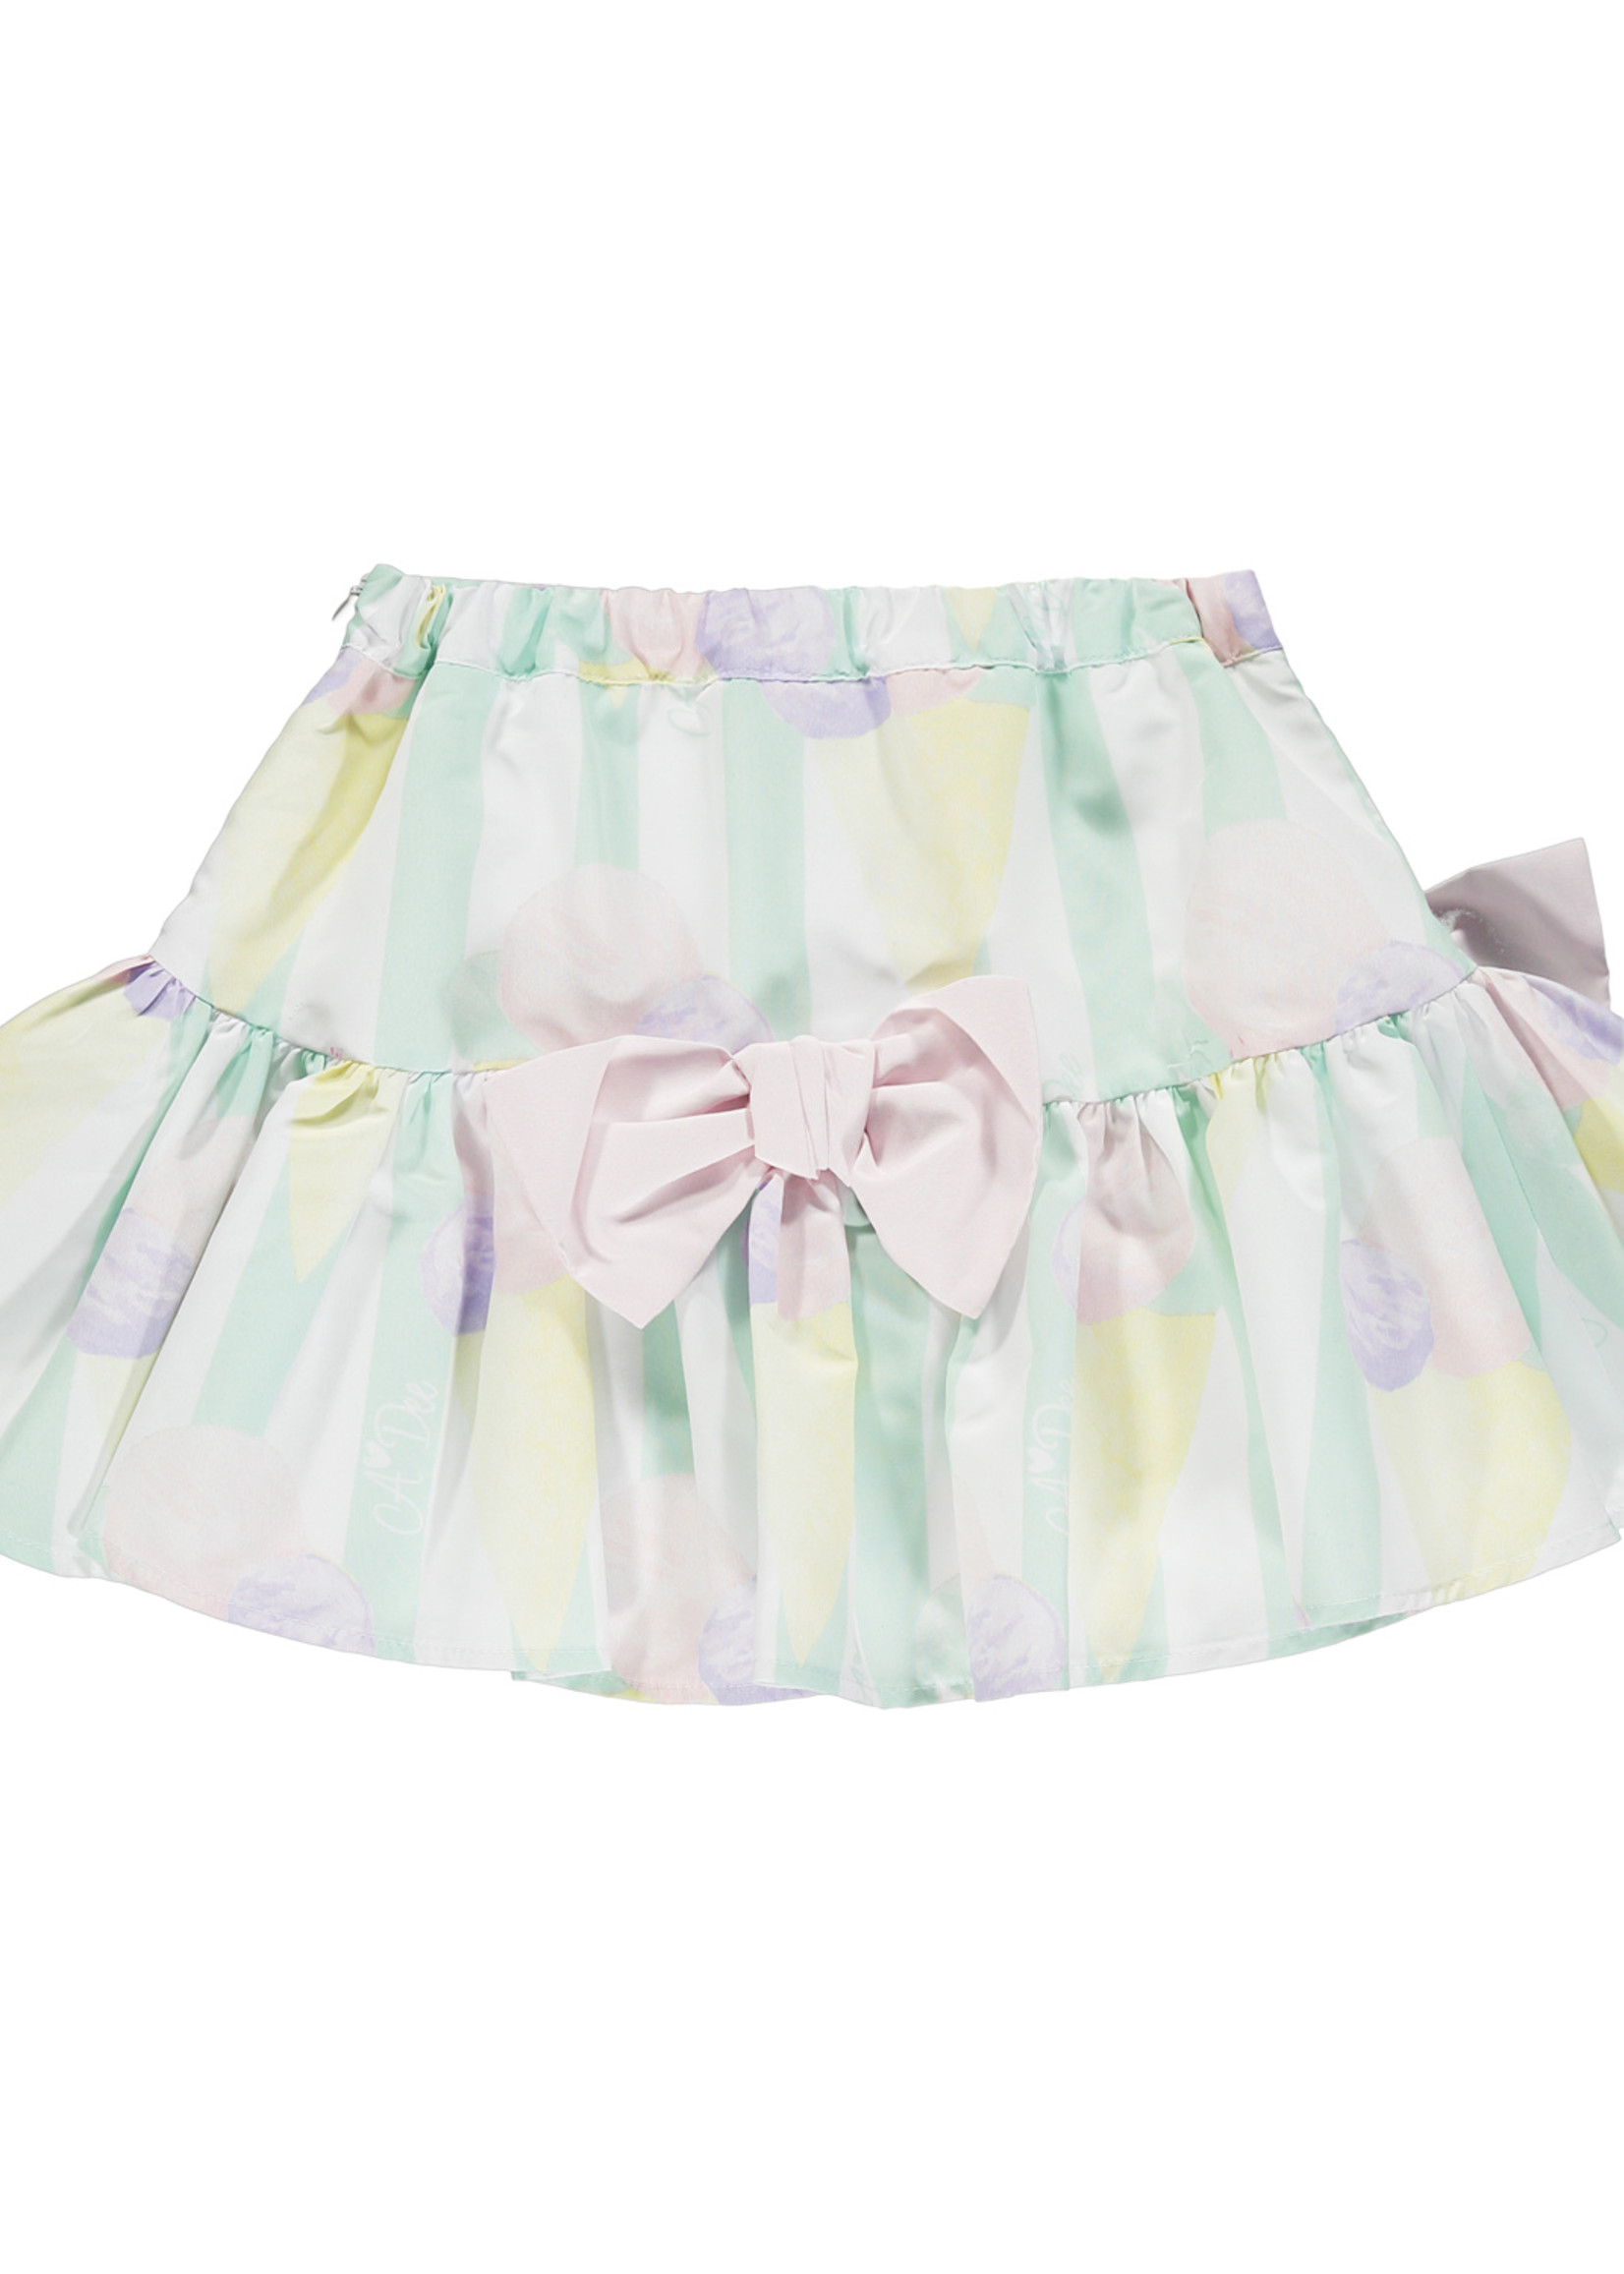 A Dee Ondrea ice cream print skirt